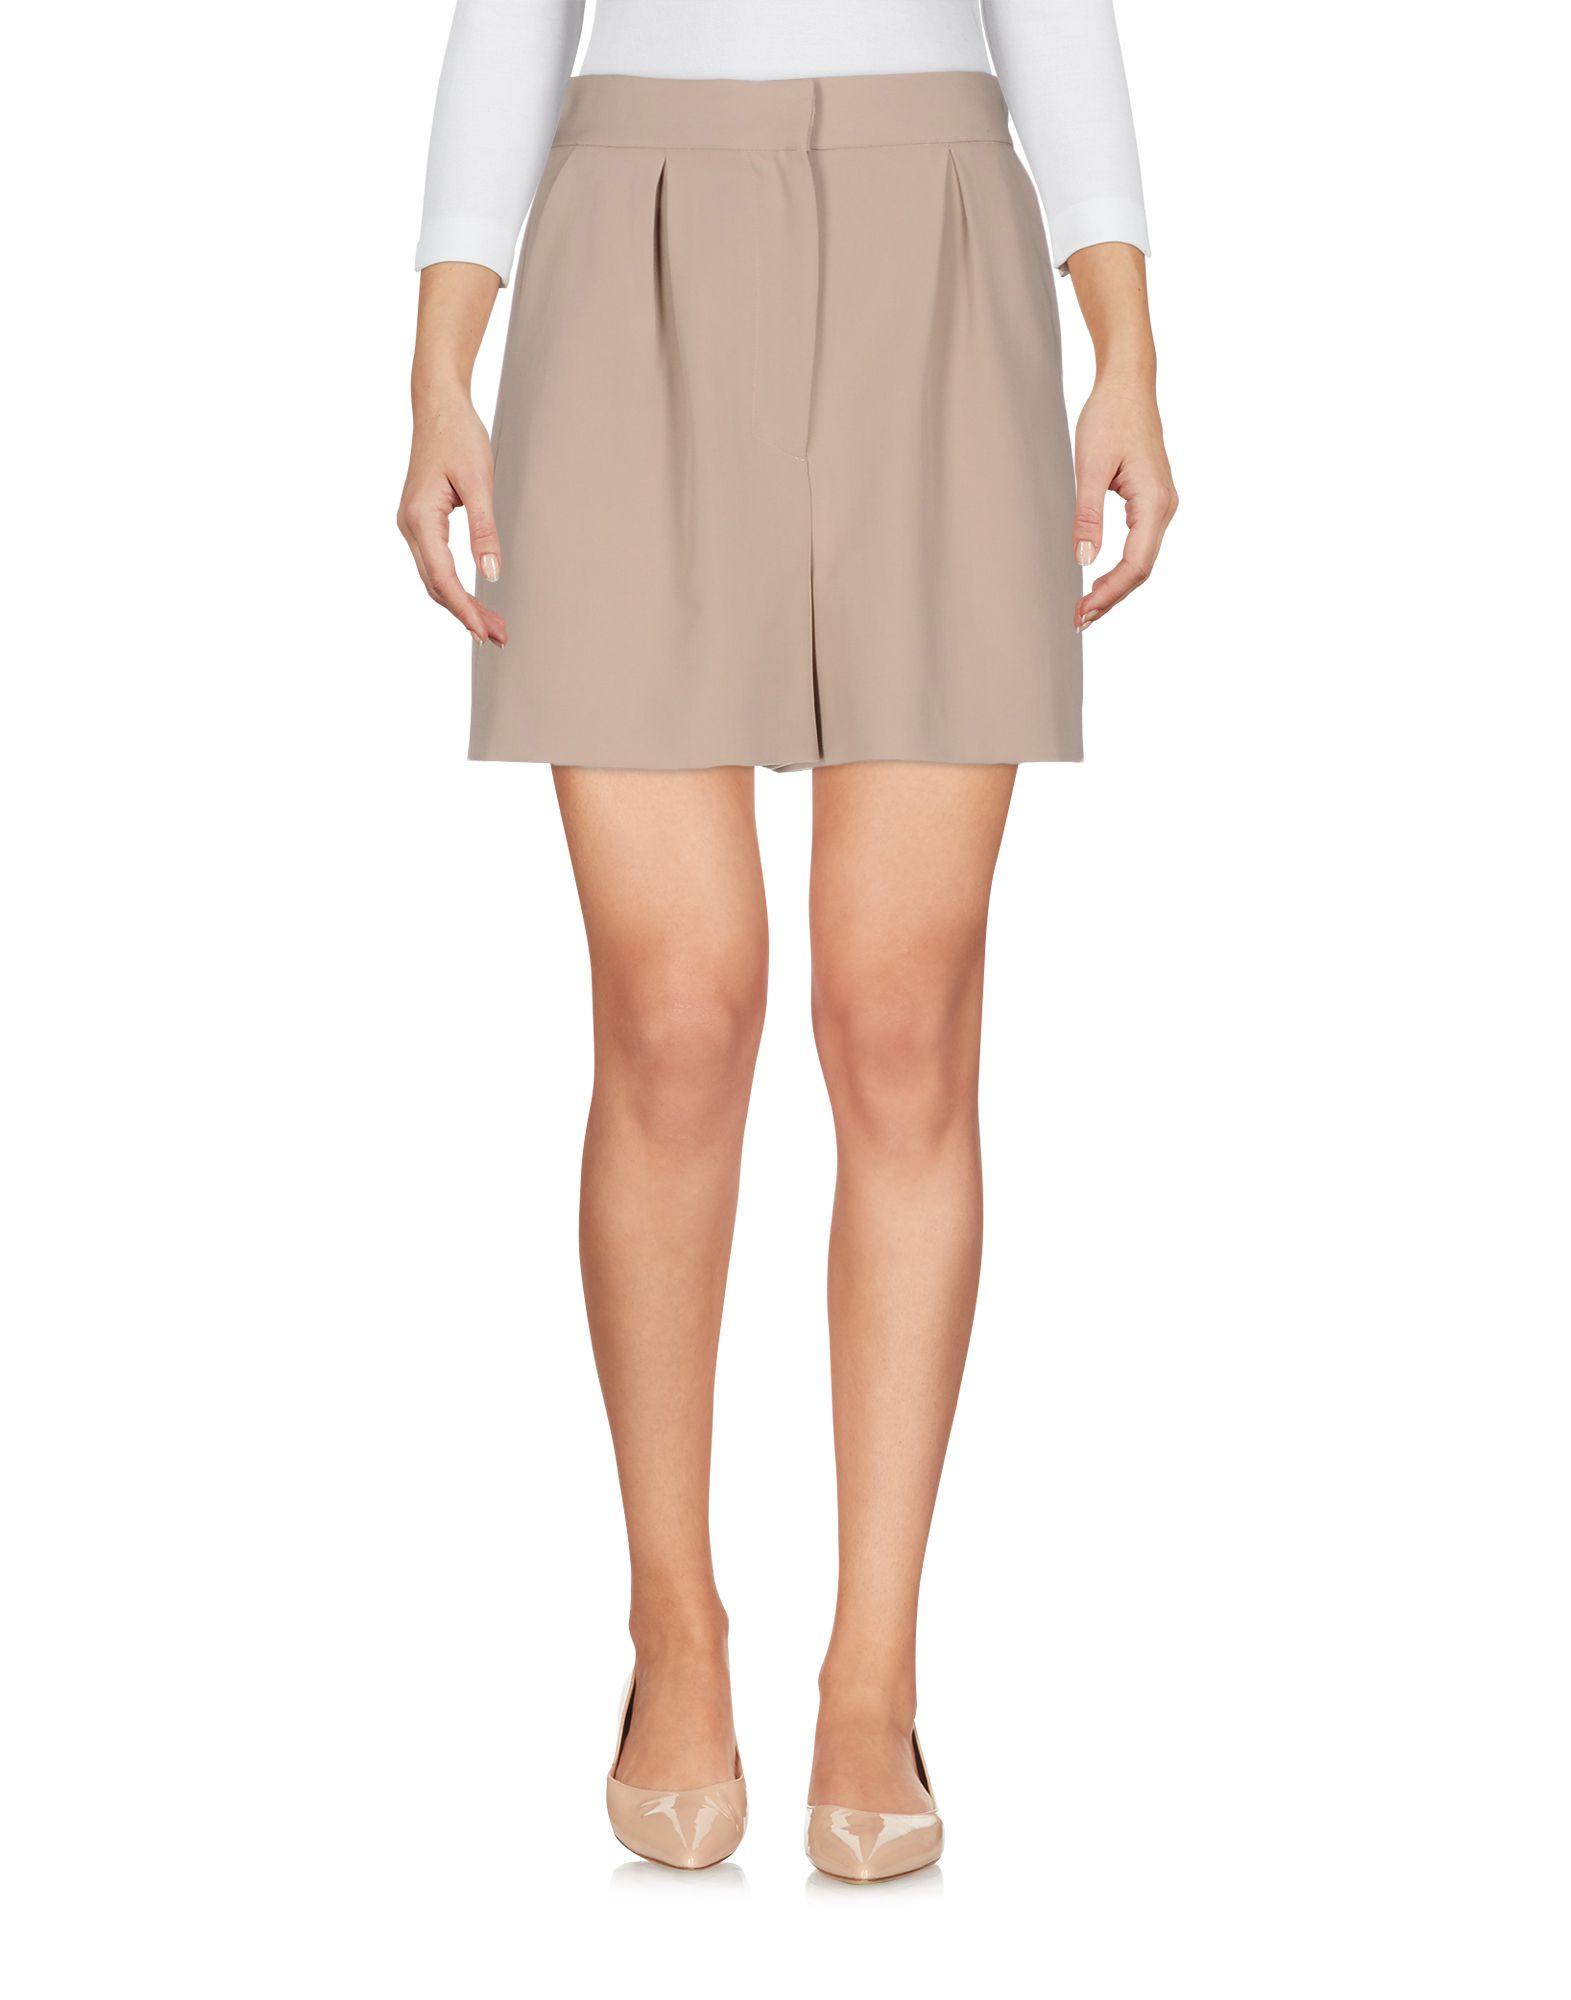 Shorts Alex Vidal Donna - Acquista online su pEv8nfRlL